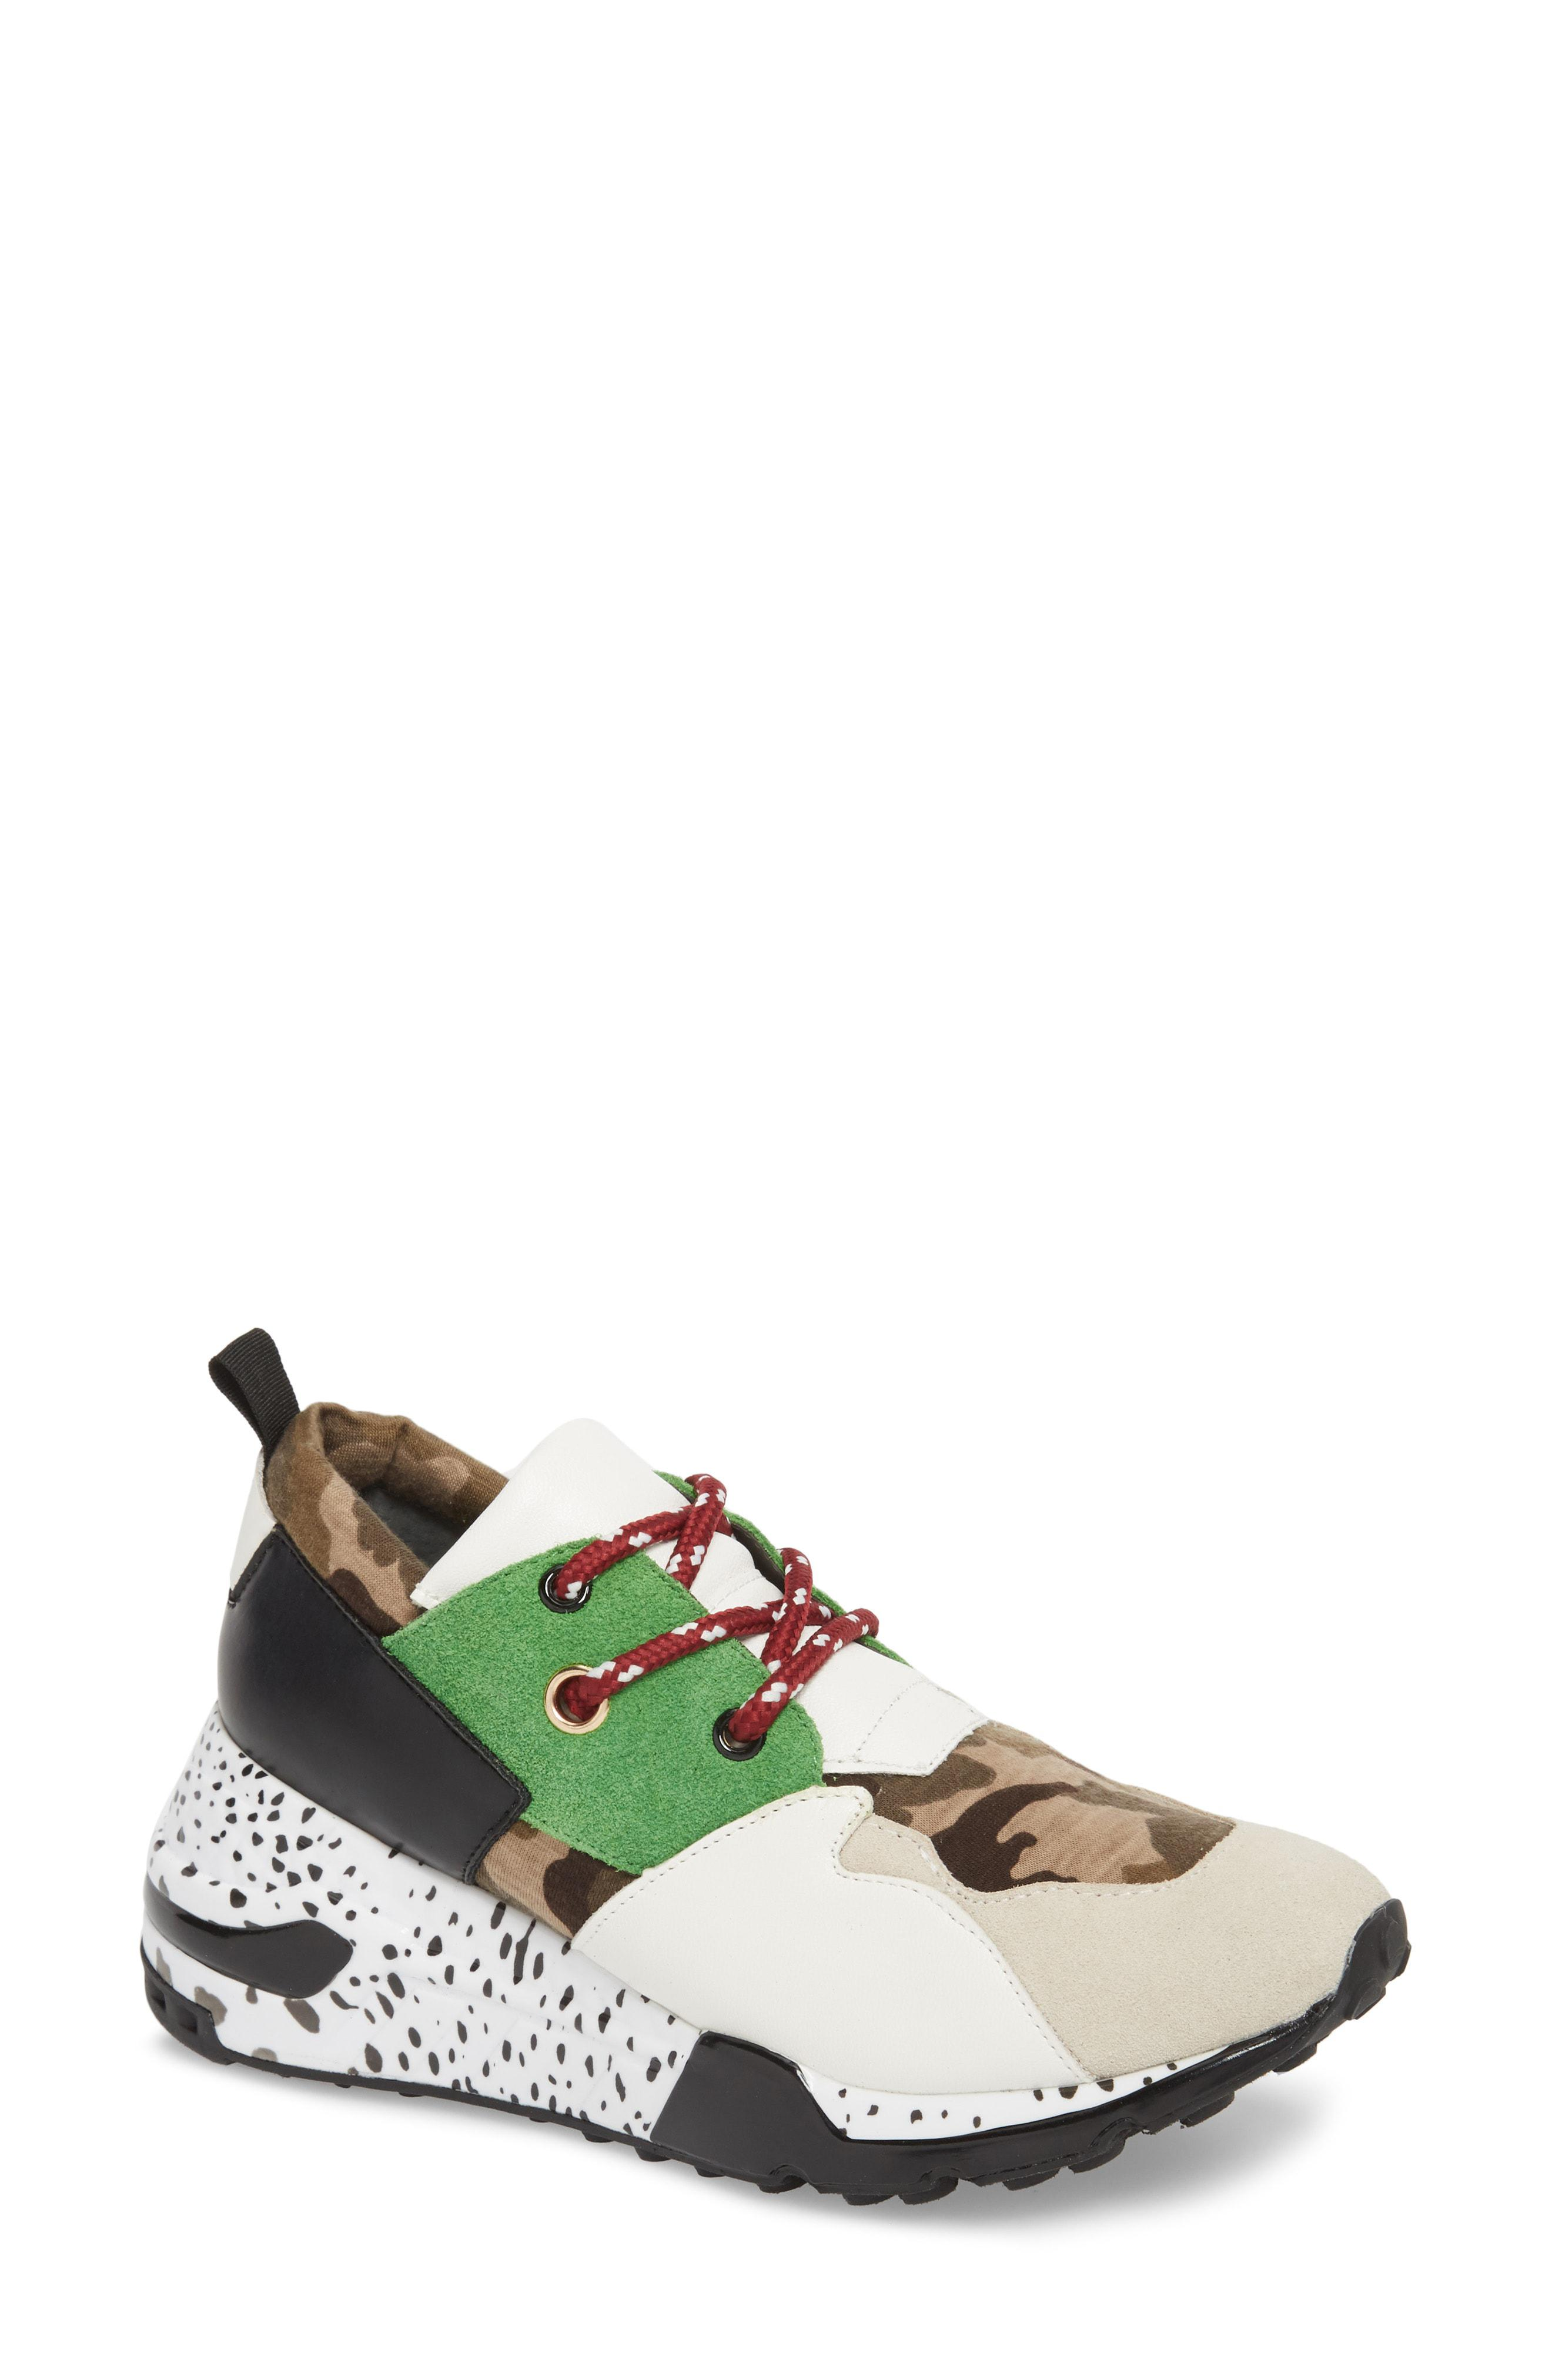 dda243f226e Lyst - Steve Madden Cliff Sneaker in Green